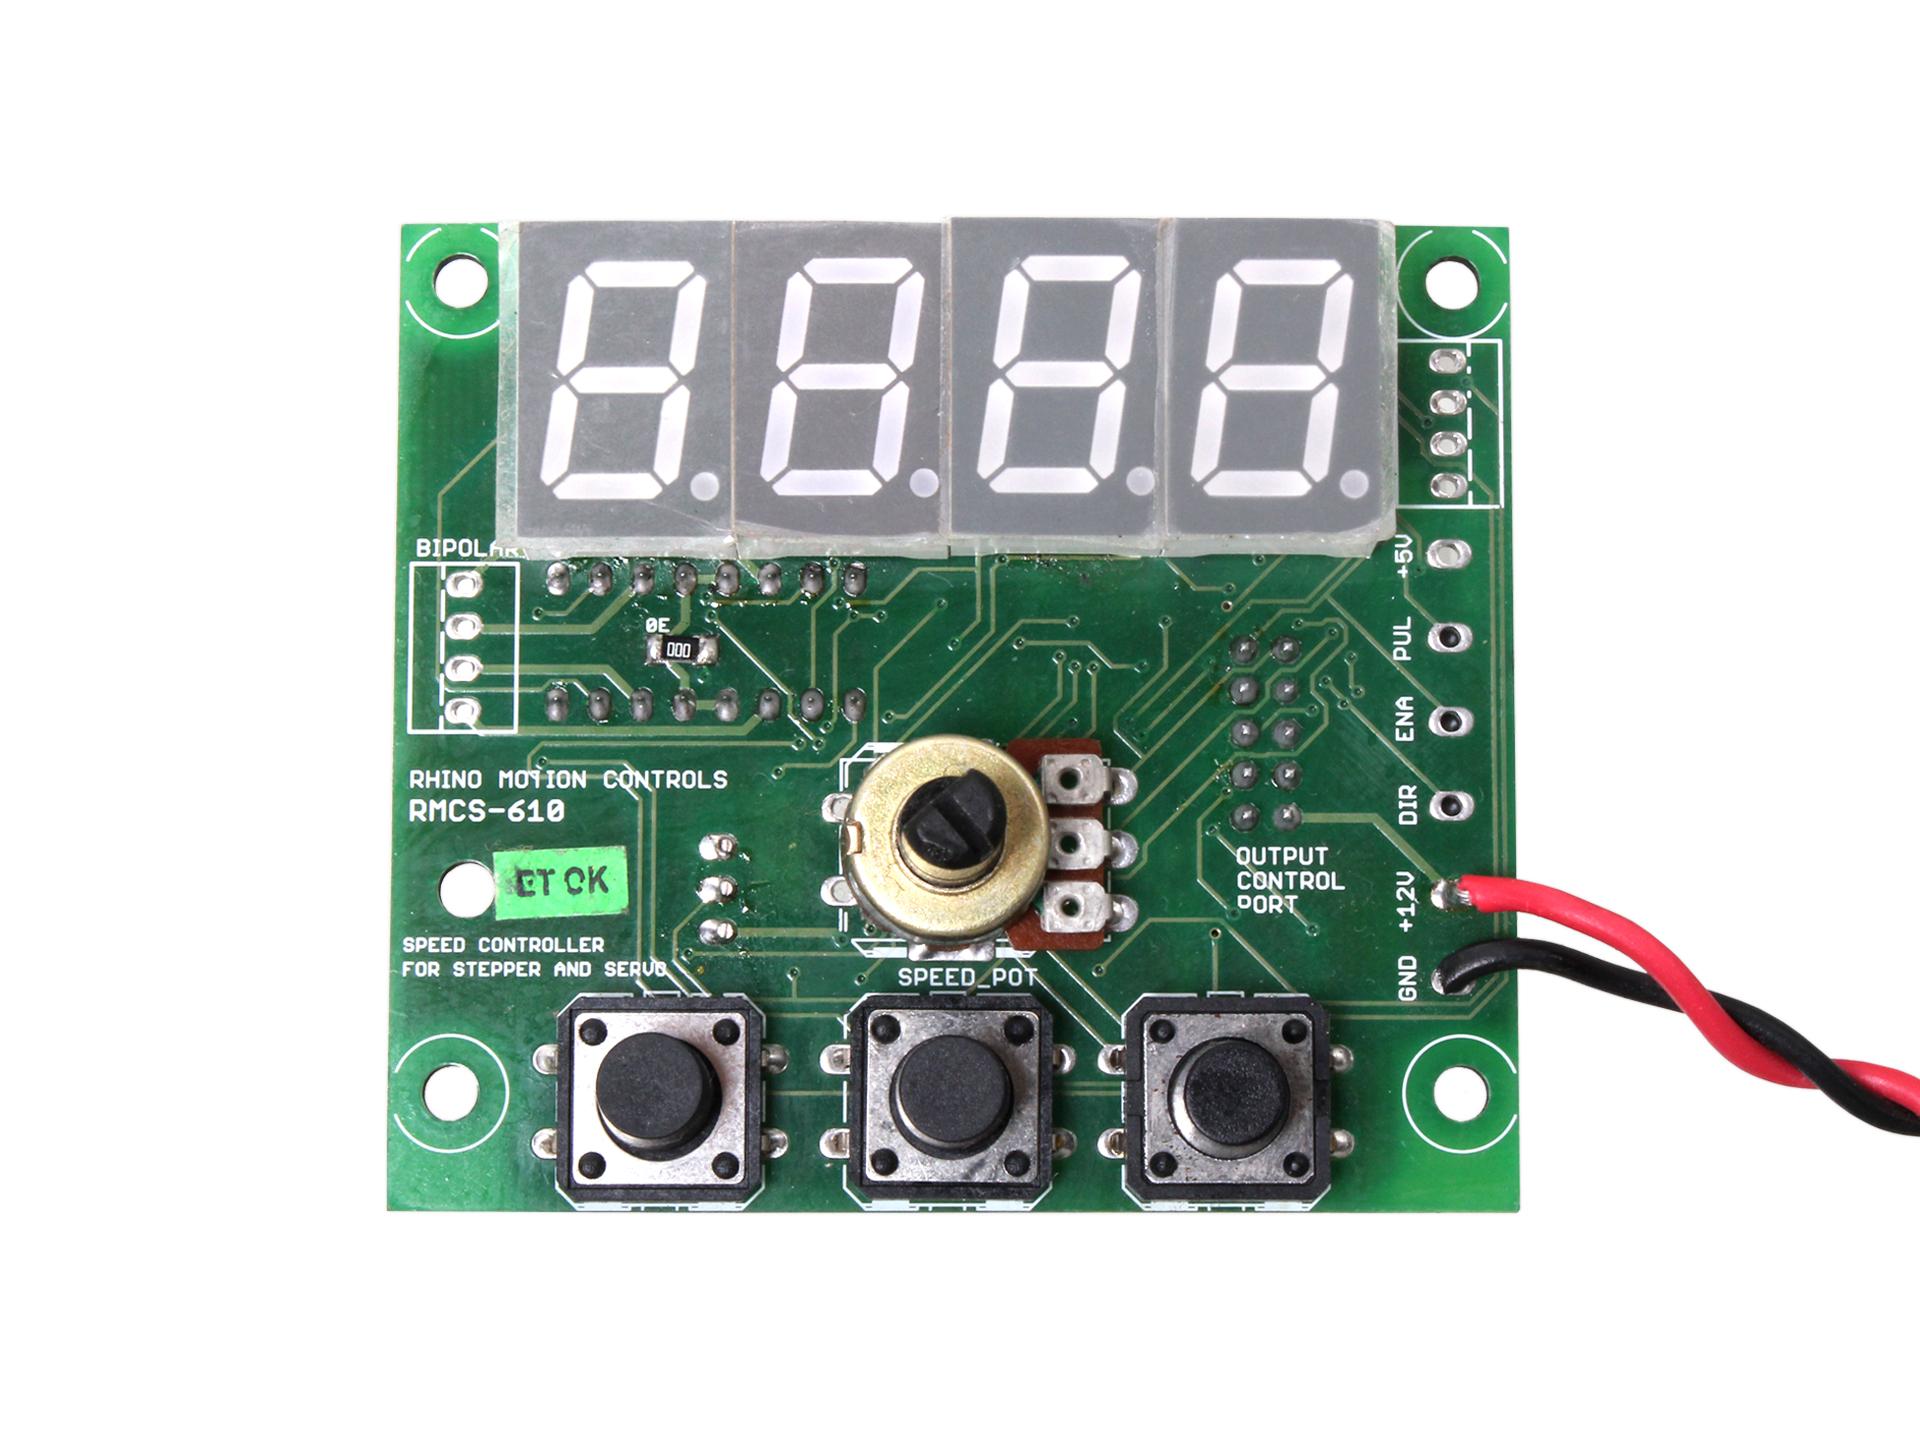 Digital speed controller rmcs 6102 rhino motion for Stepper motor torque control